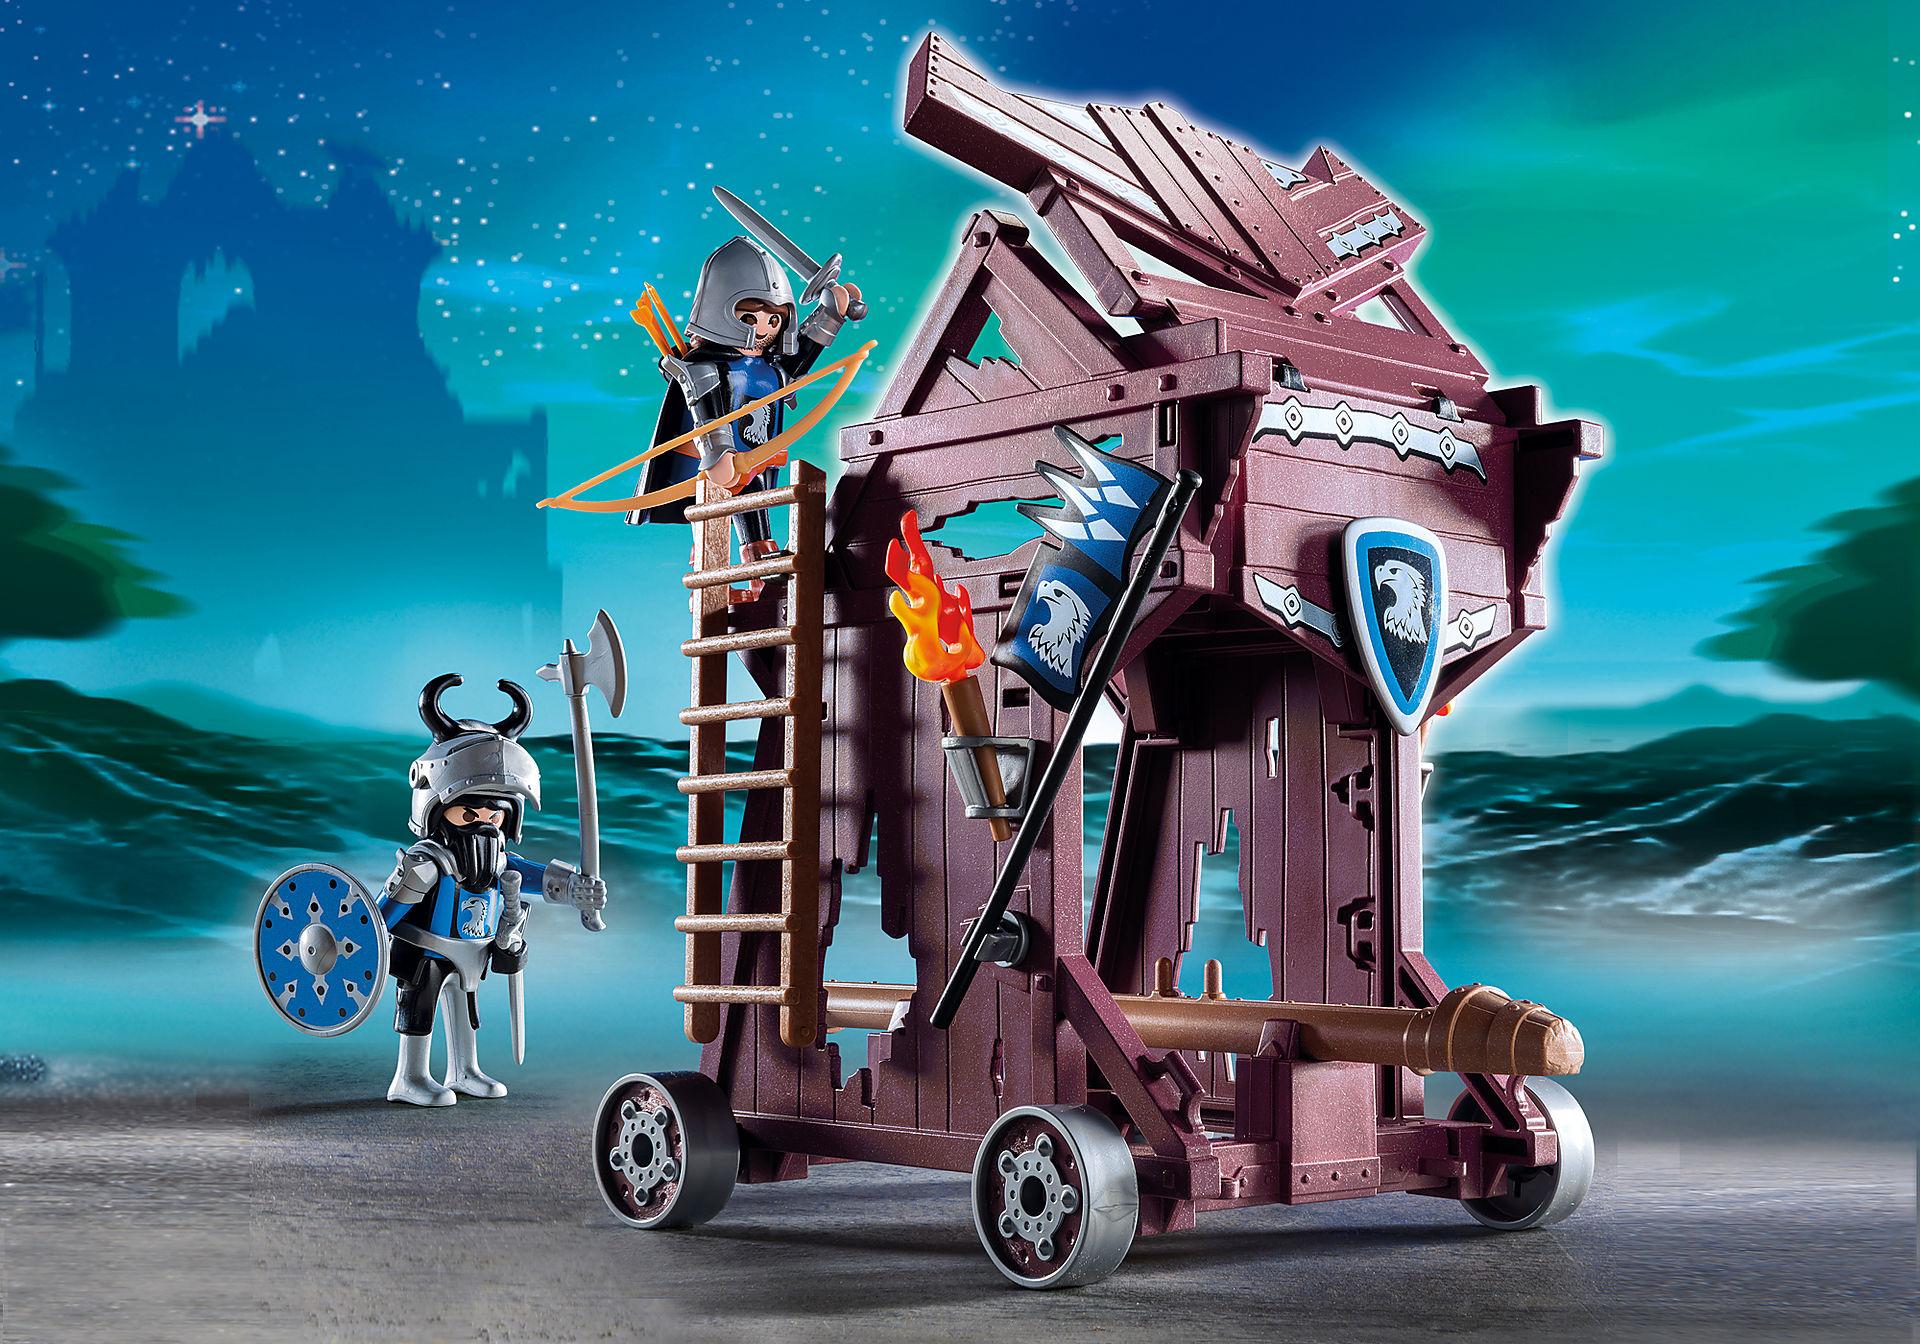 http://media.playmobil.com/i/playmobil/6628_product_detail/Aanvalstoren van de Valkenridders